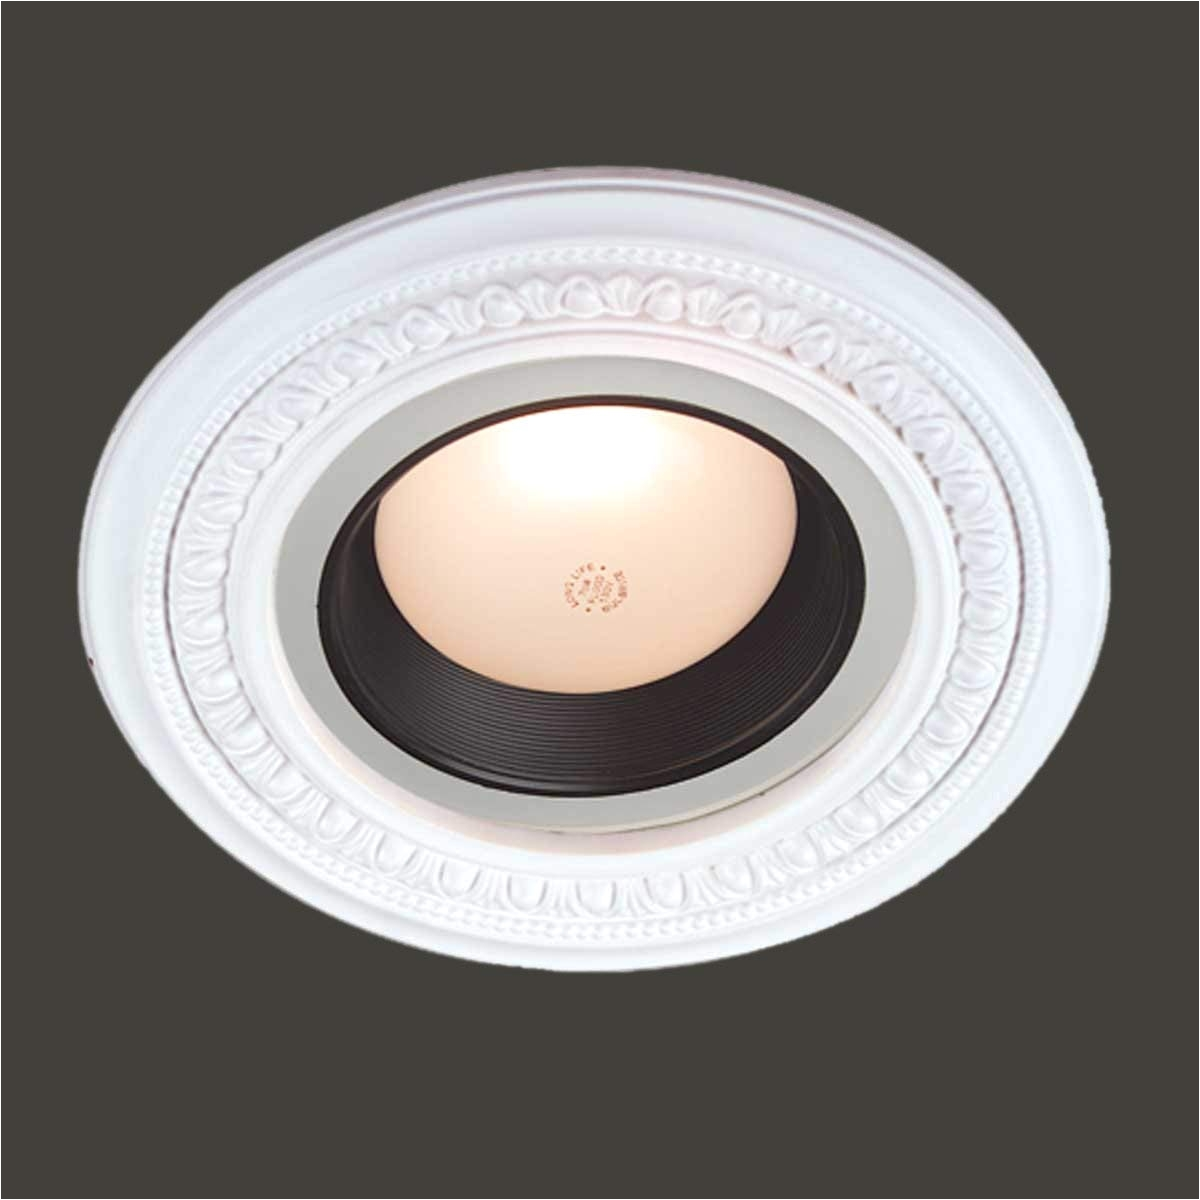 spot light ring white trim 5 id x 9 od mini medallion renovators supply recessed light fixture trims amazon com